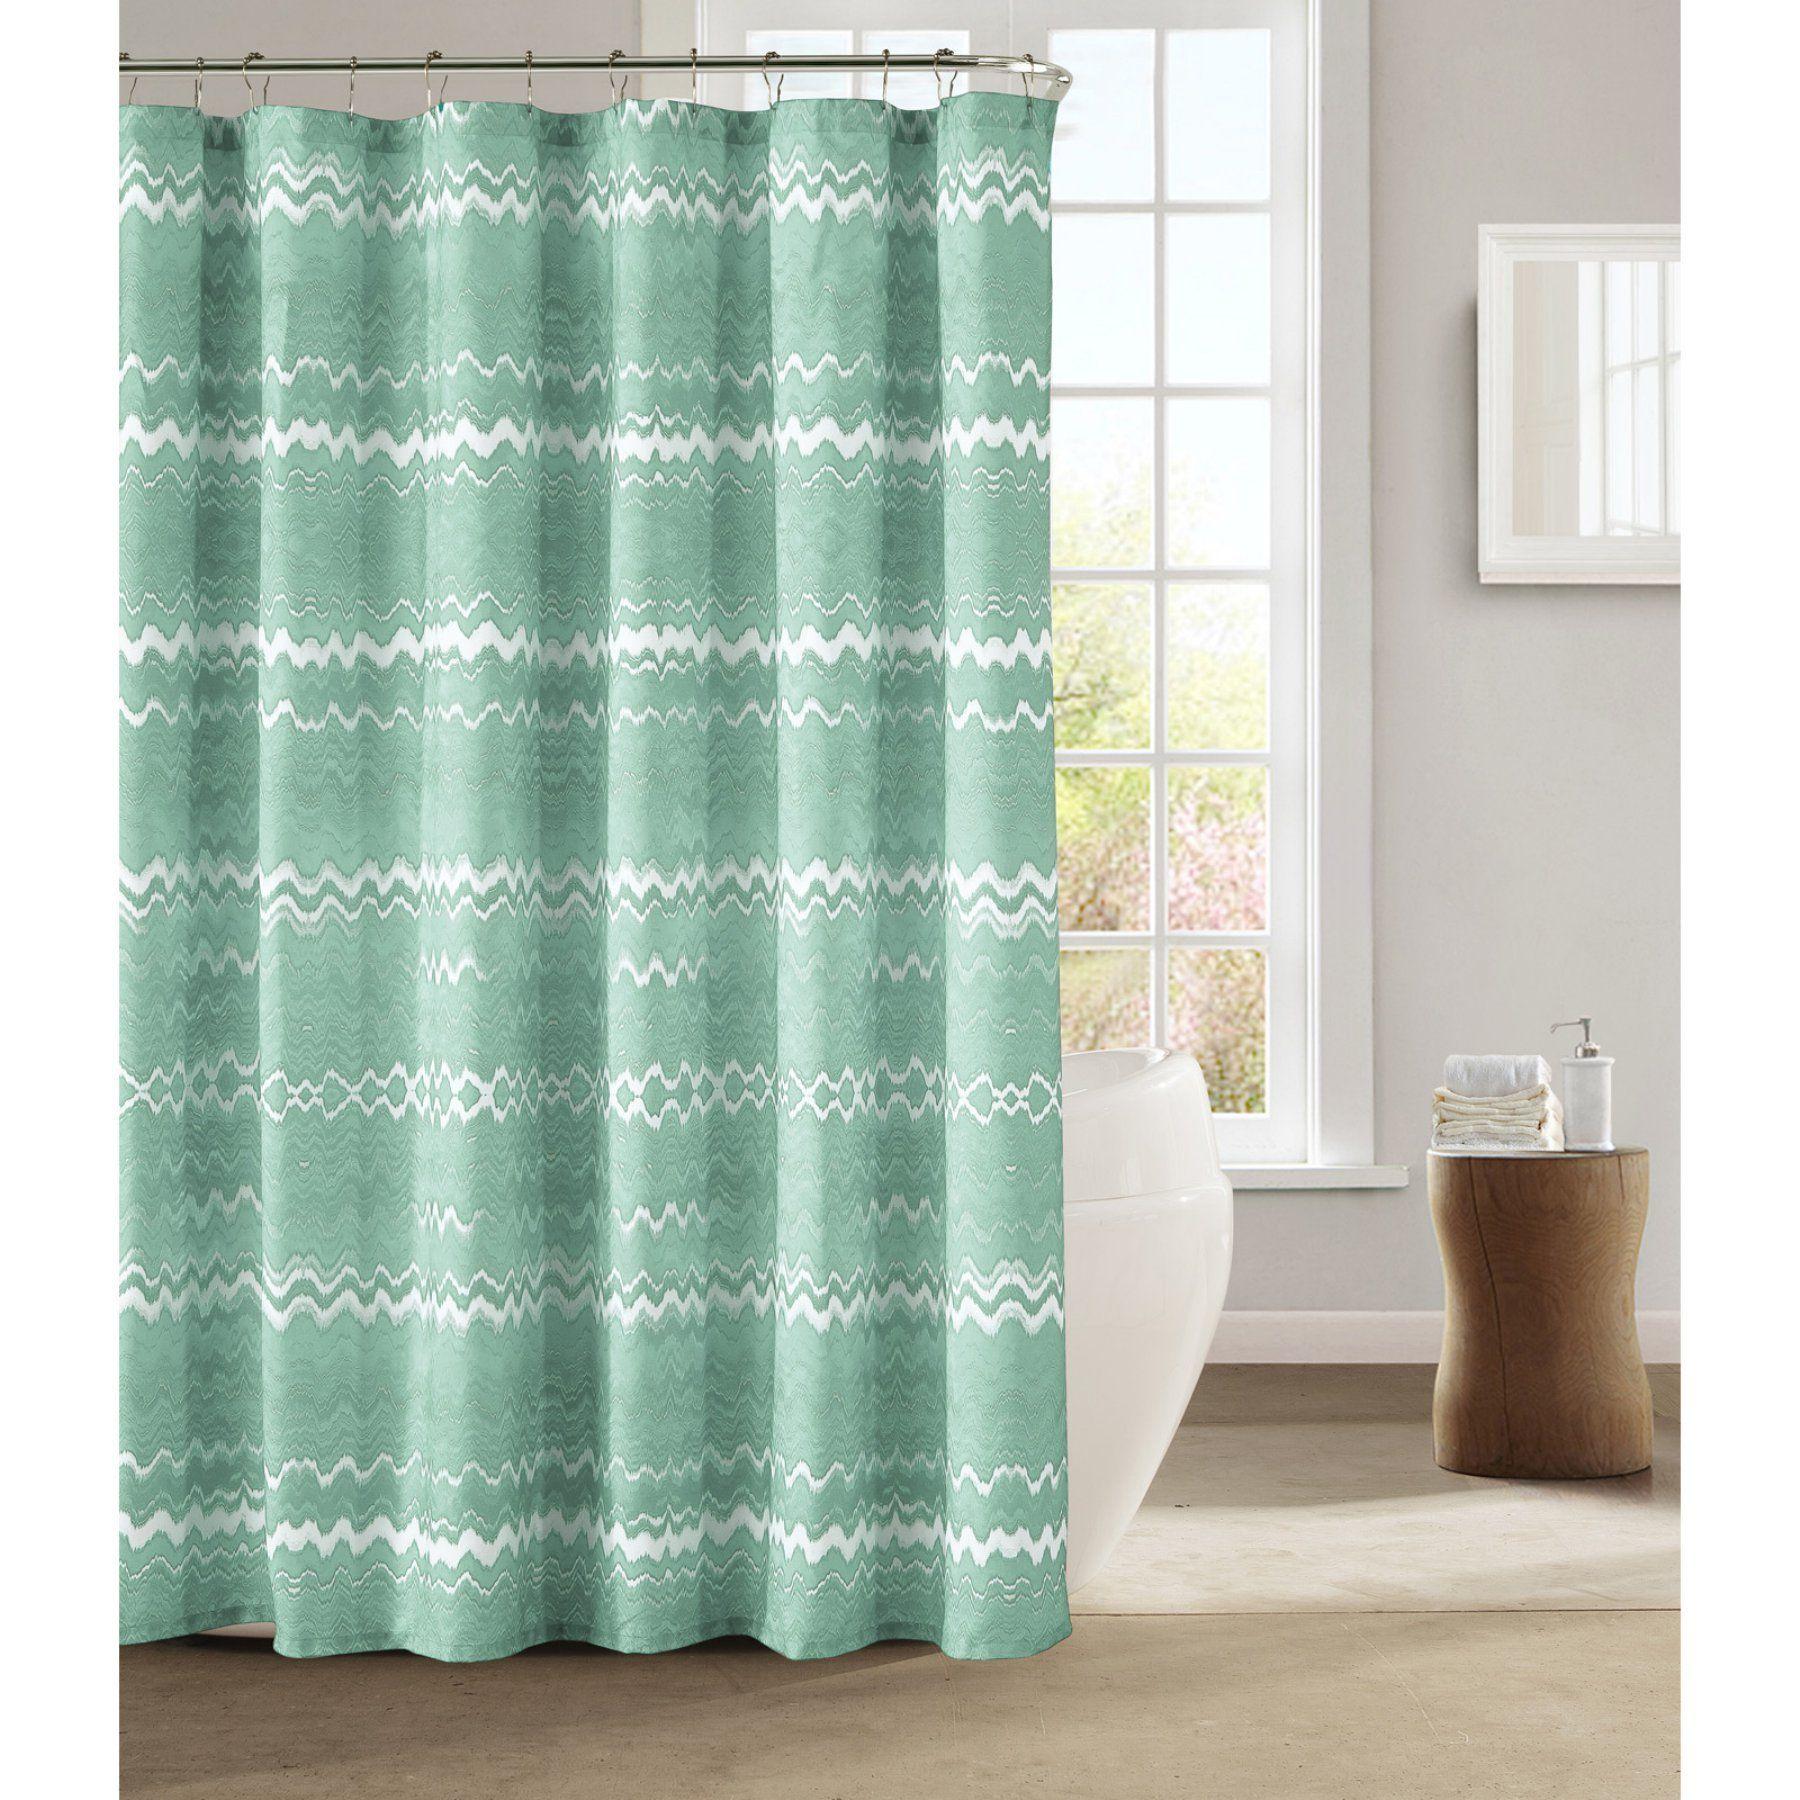 Kensie Mikaela Satin Microfiber Fabric Shower Curtain Misgg 12